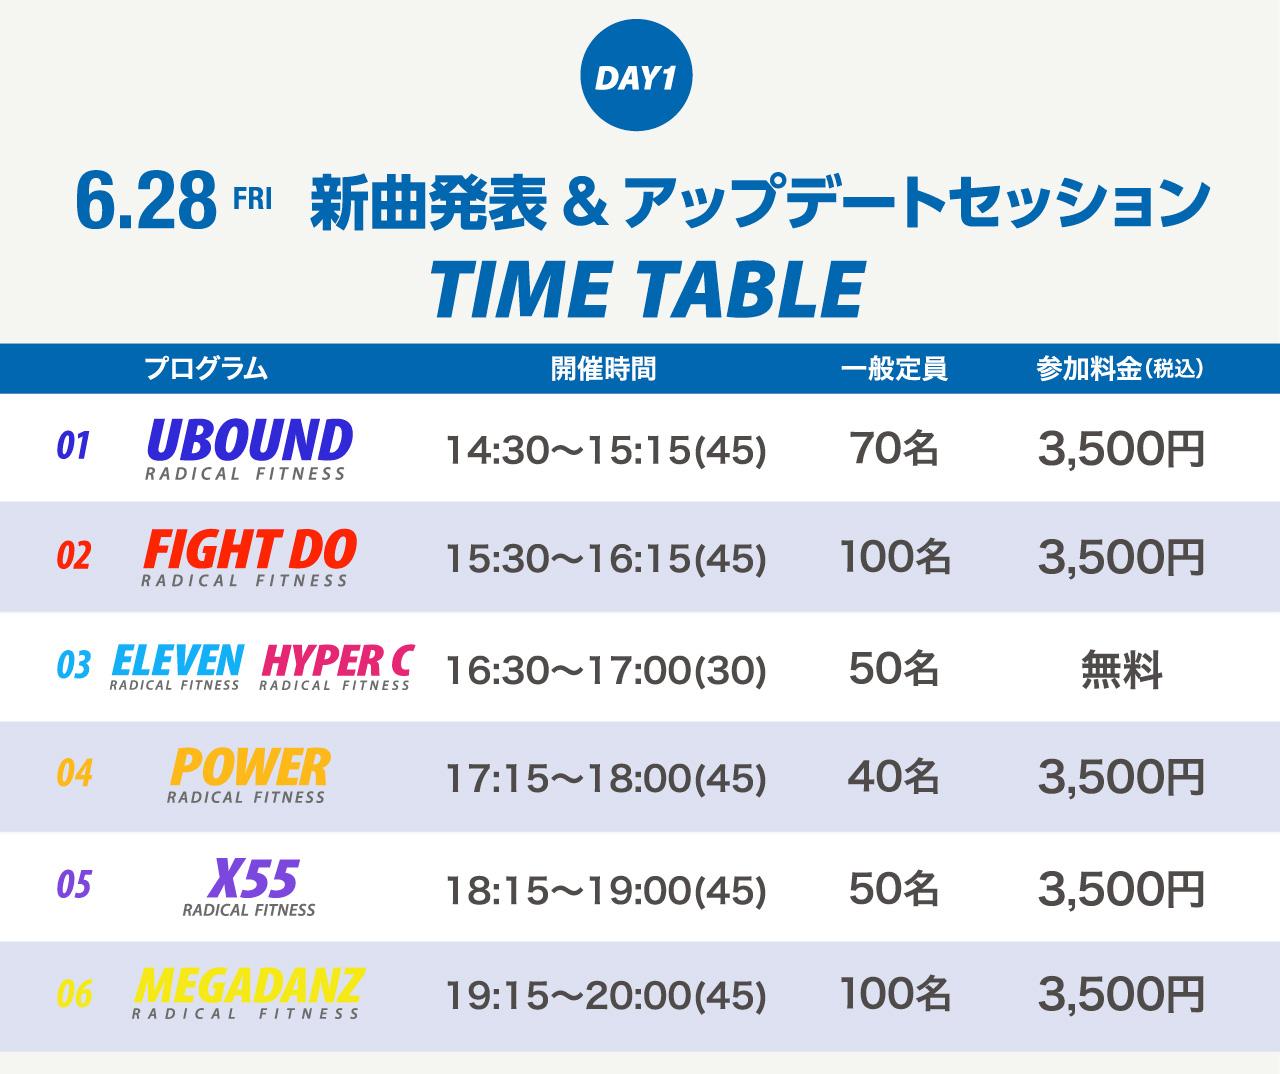 6.29 FRI新曲発表&アップデート会 TIME TABLE